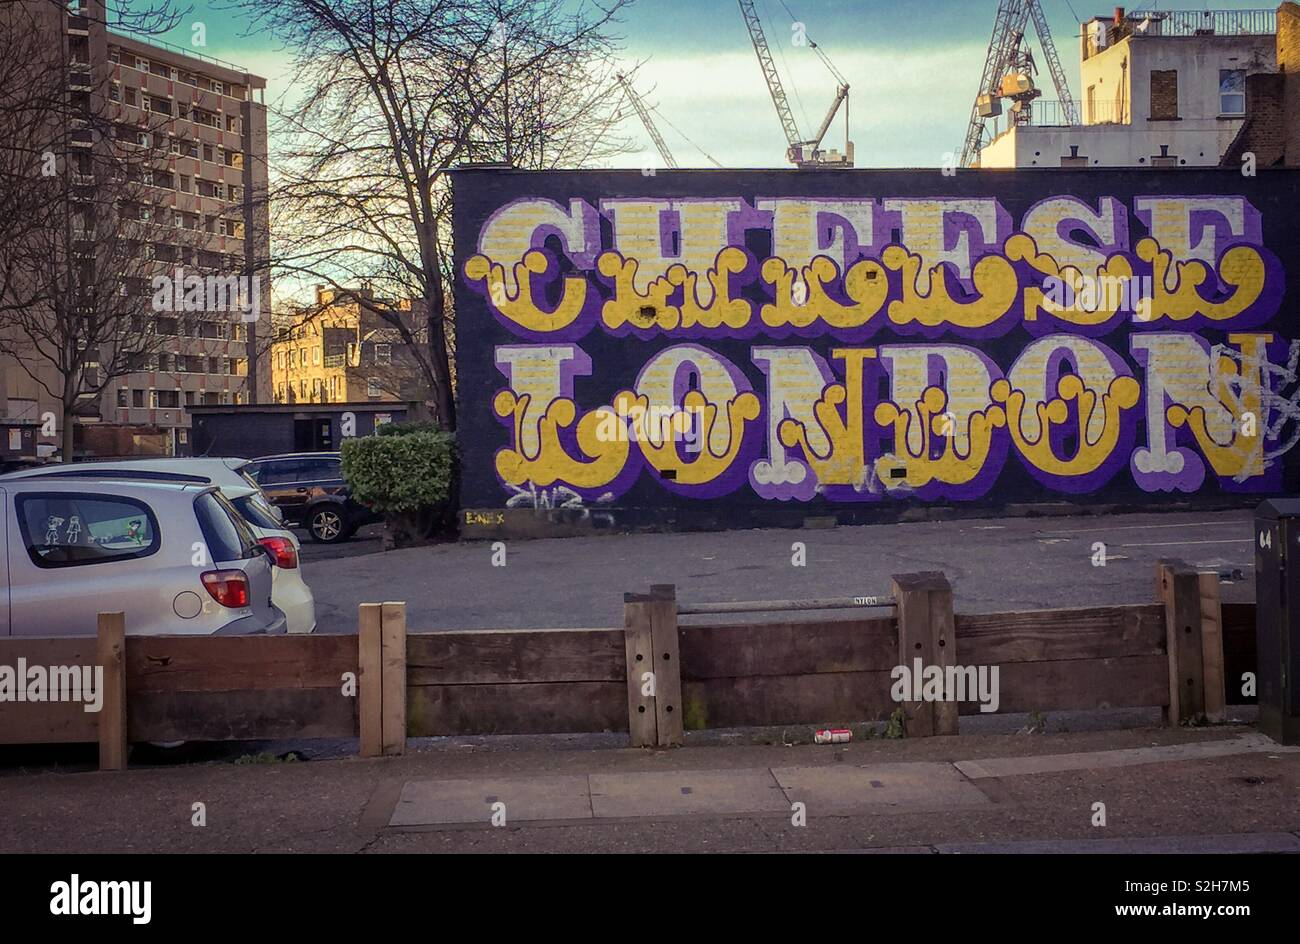 Street Art by Eine, East London - Stock Image